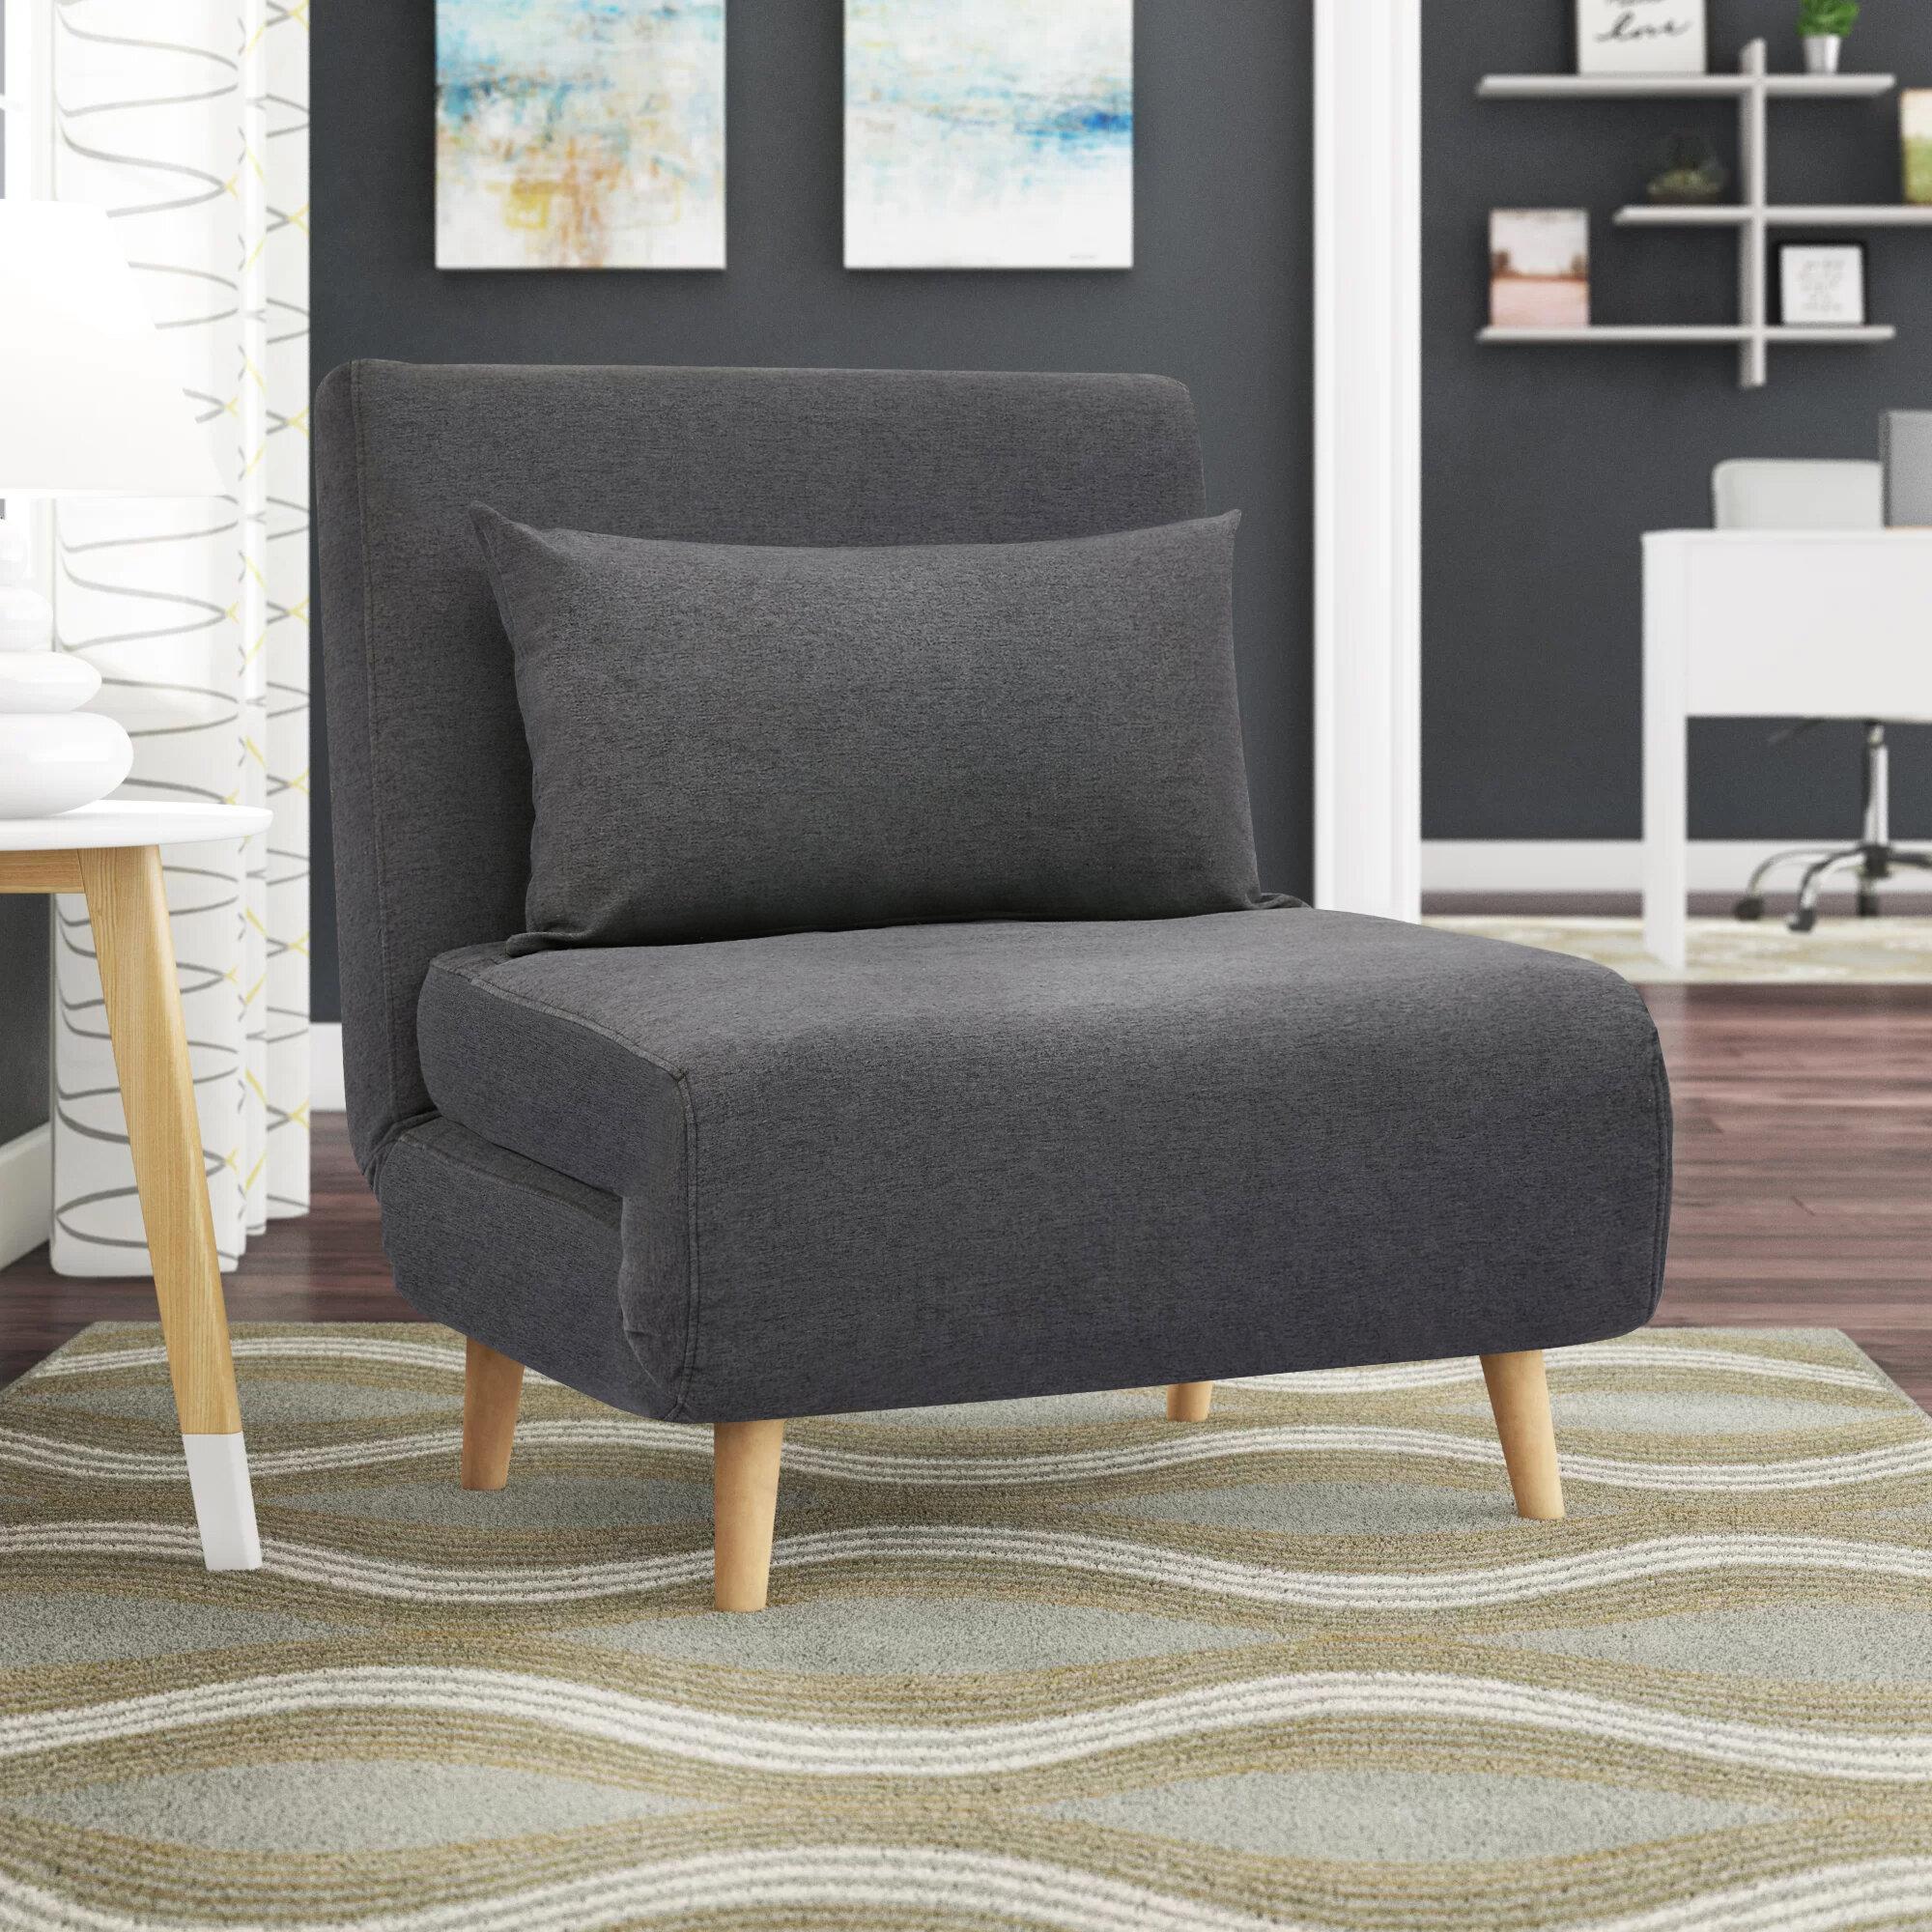 Corrigan Studio Bolen Convertible Chair Reviews Wayfair Ca